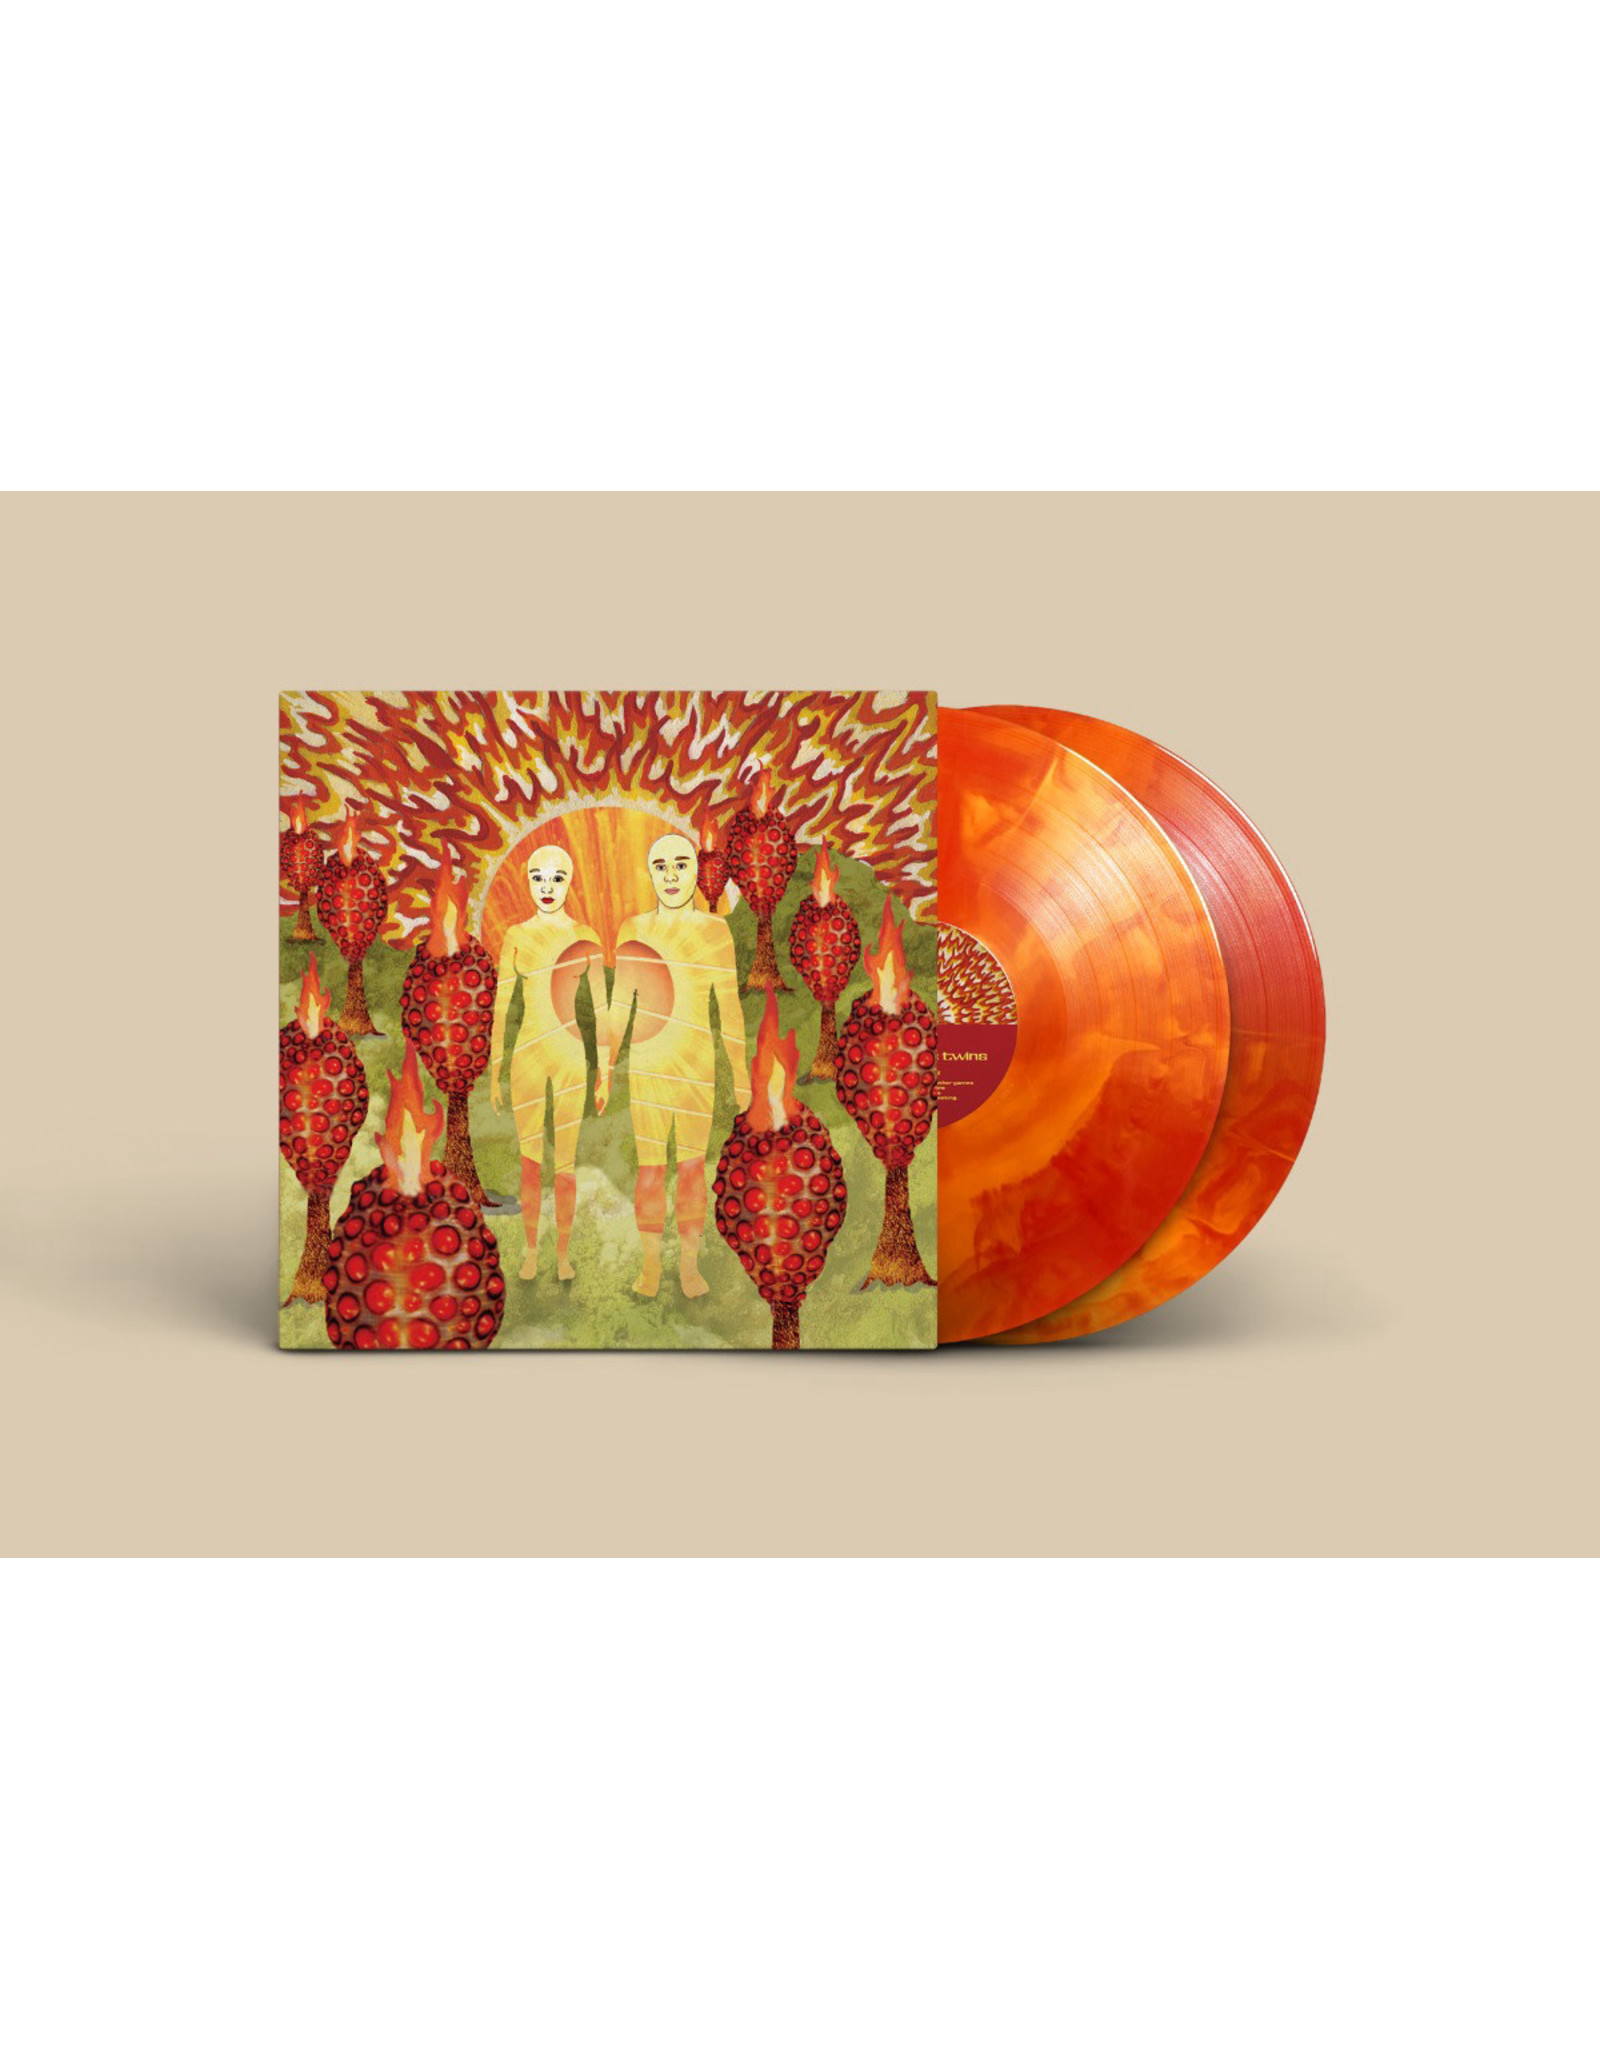 Of Montreal - The Sunlandic Twins LP (Dlx. Ed. Red/Orange Swirl)